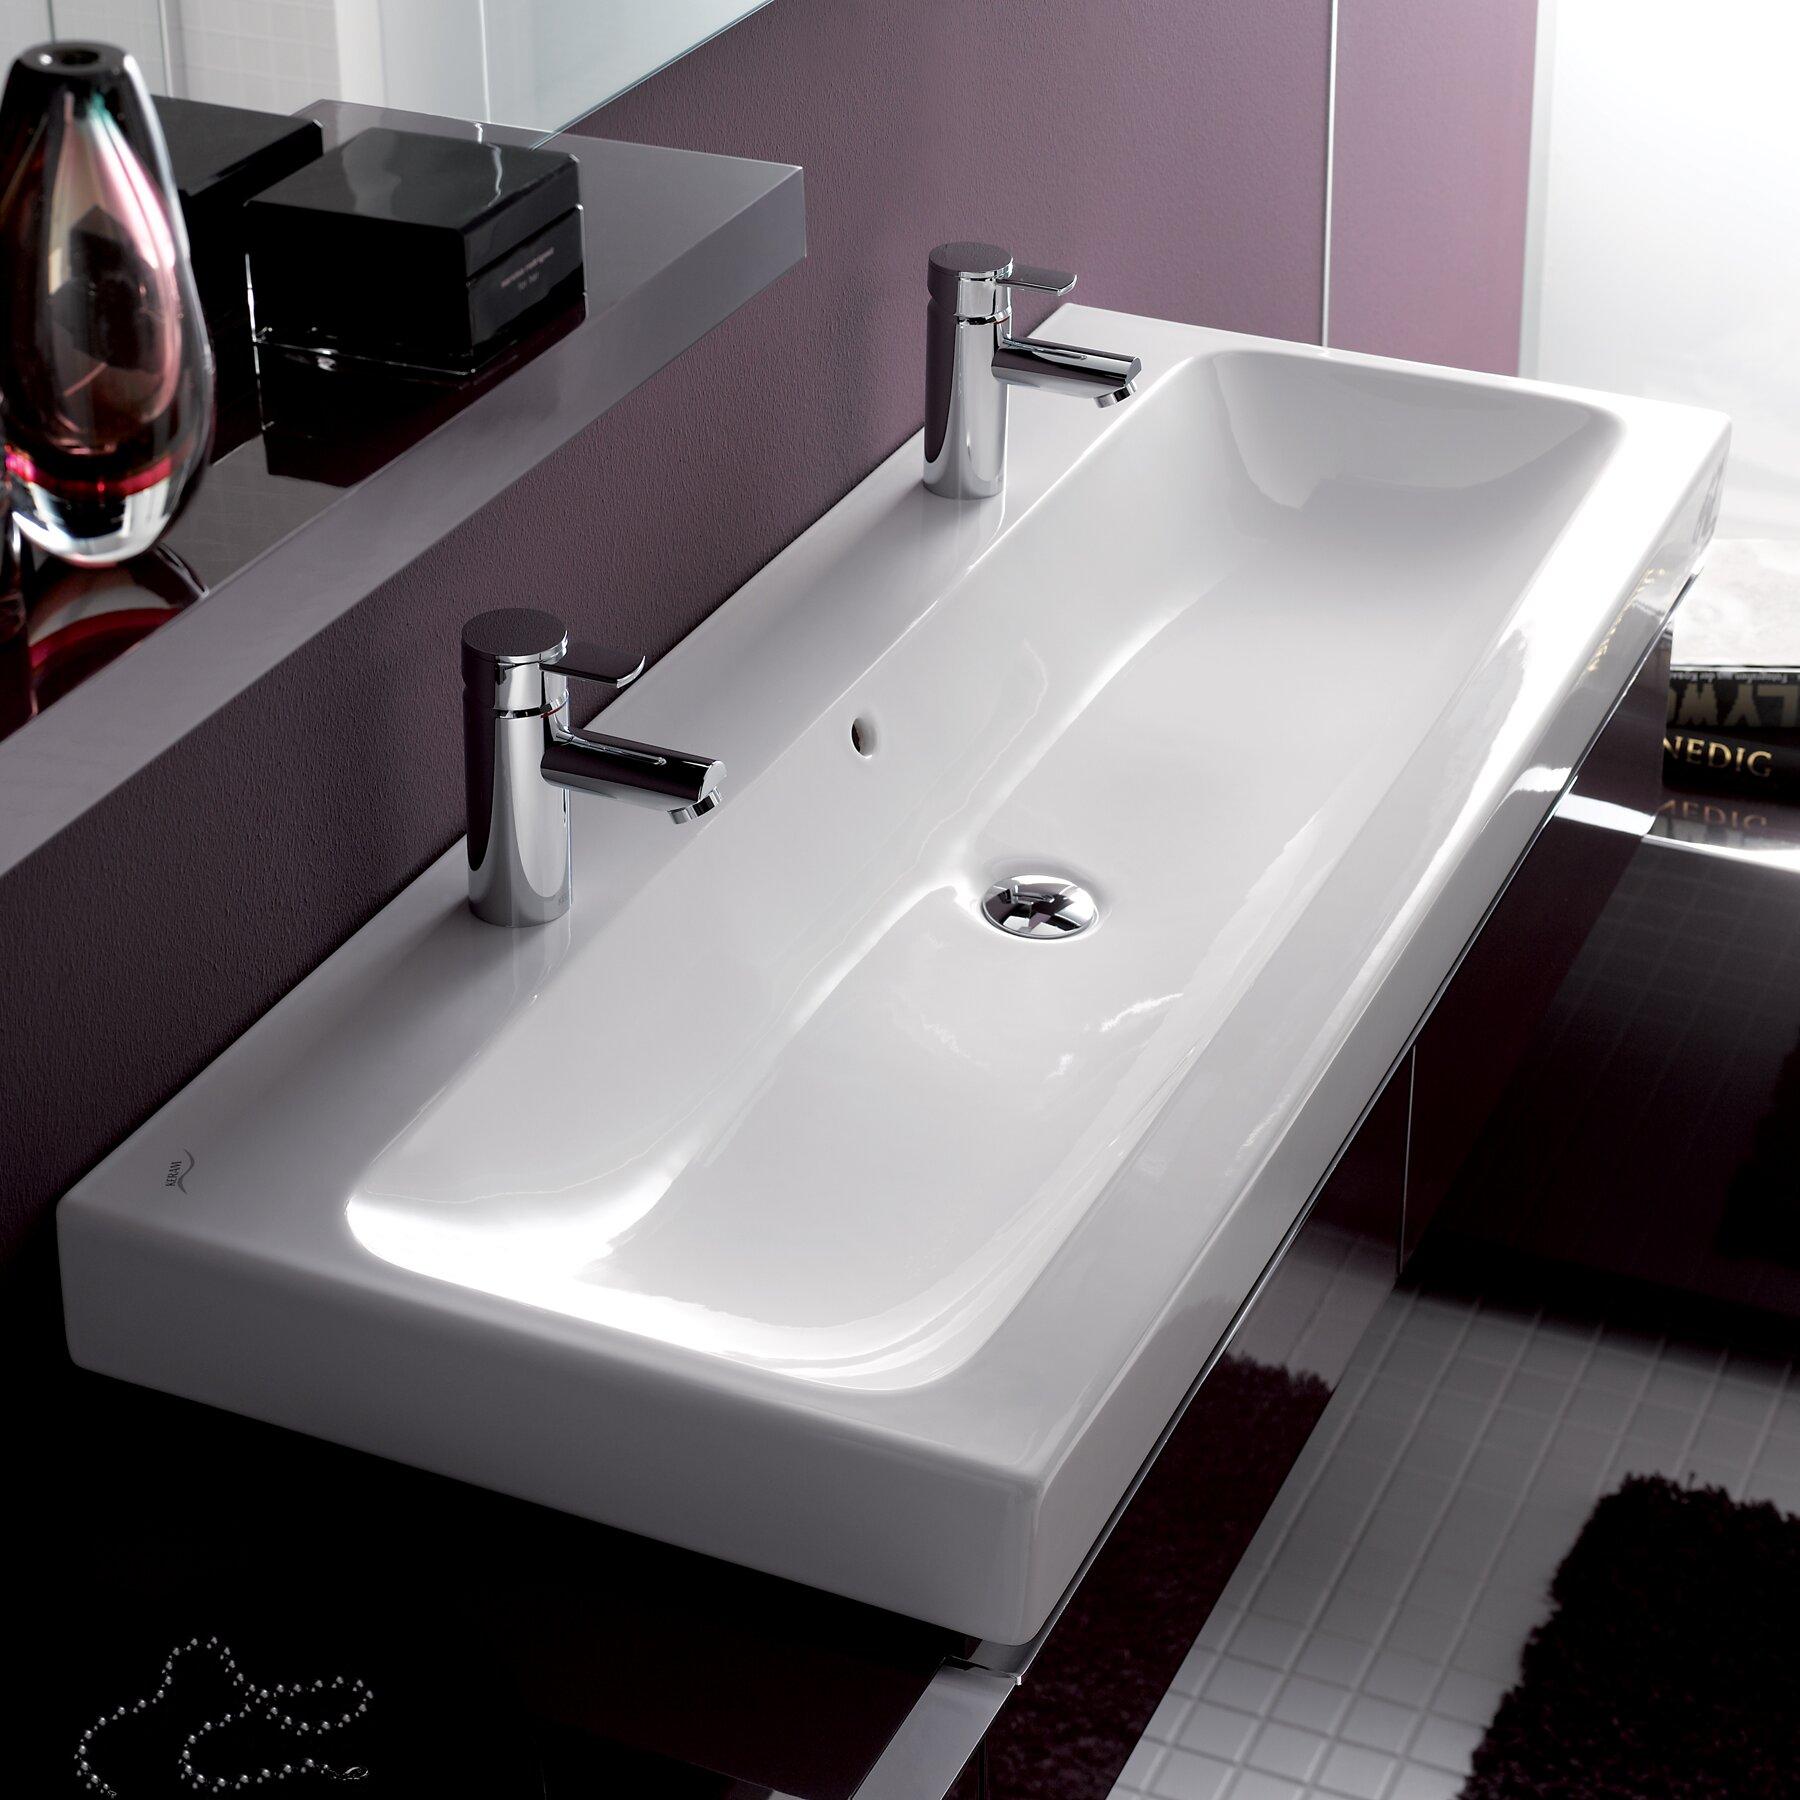 elements icon 120 bathroom sink wayfair. Black Bedroom Furniture Sets. Home Design Ideas